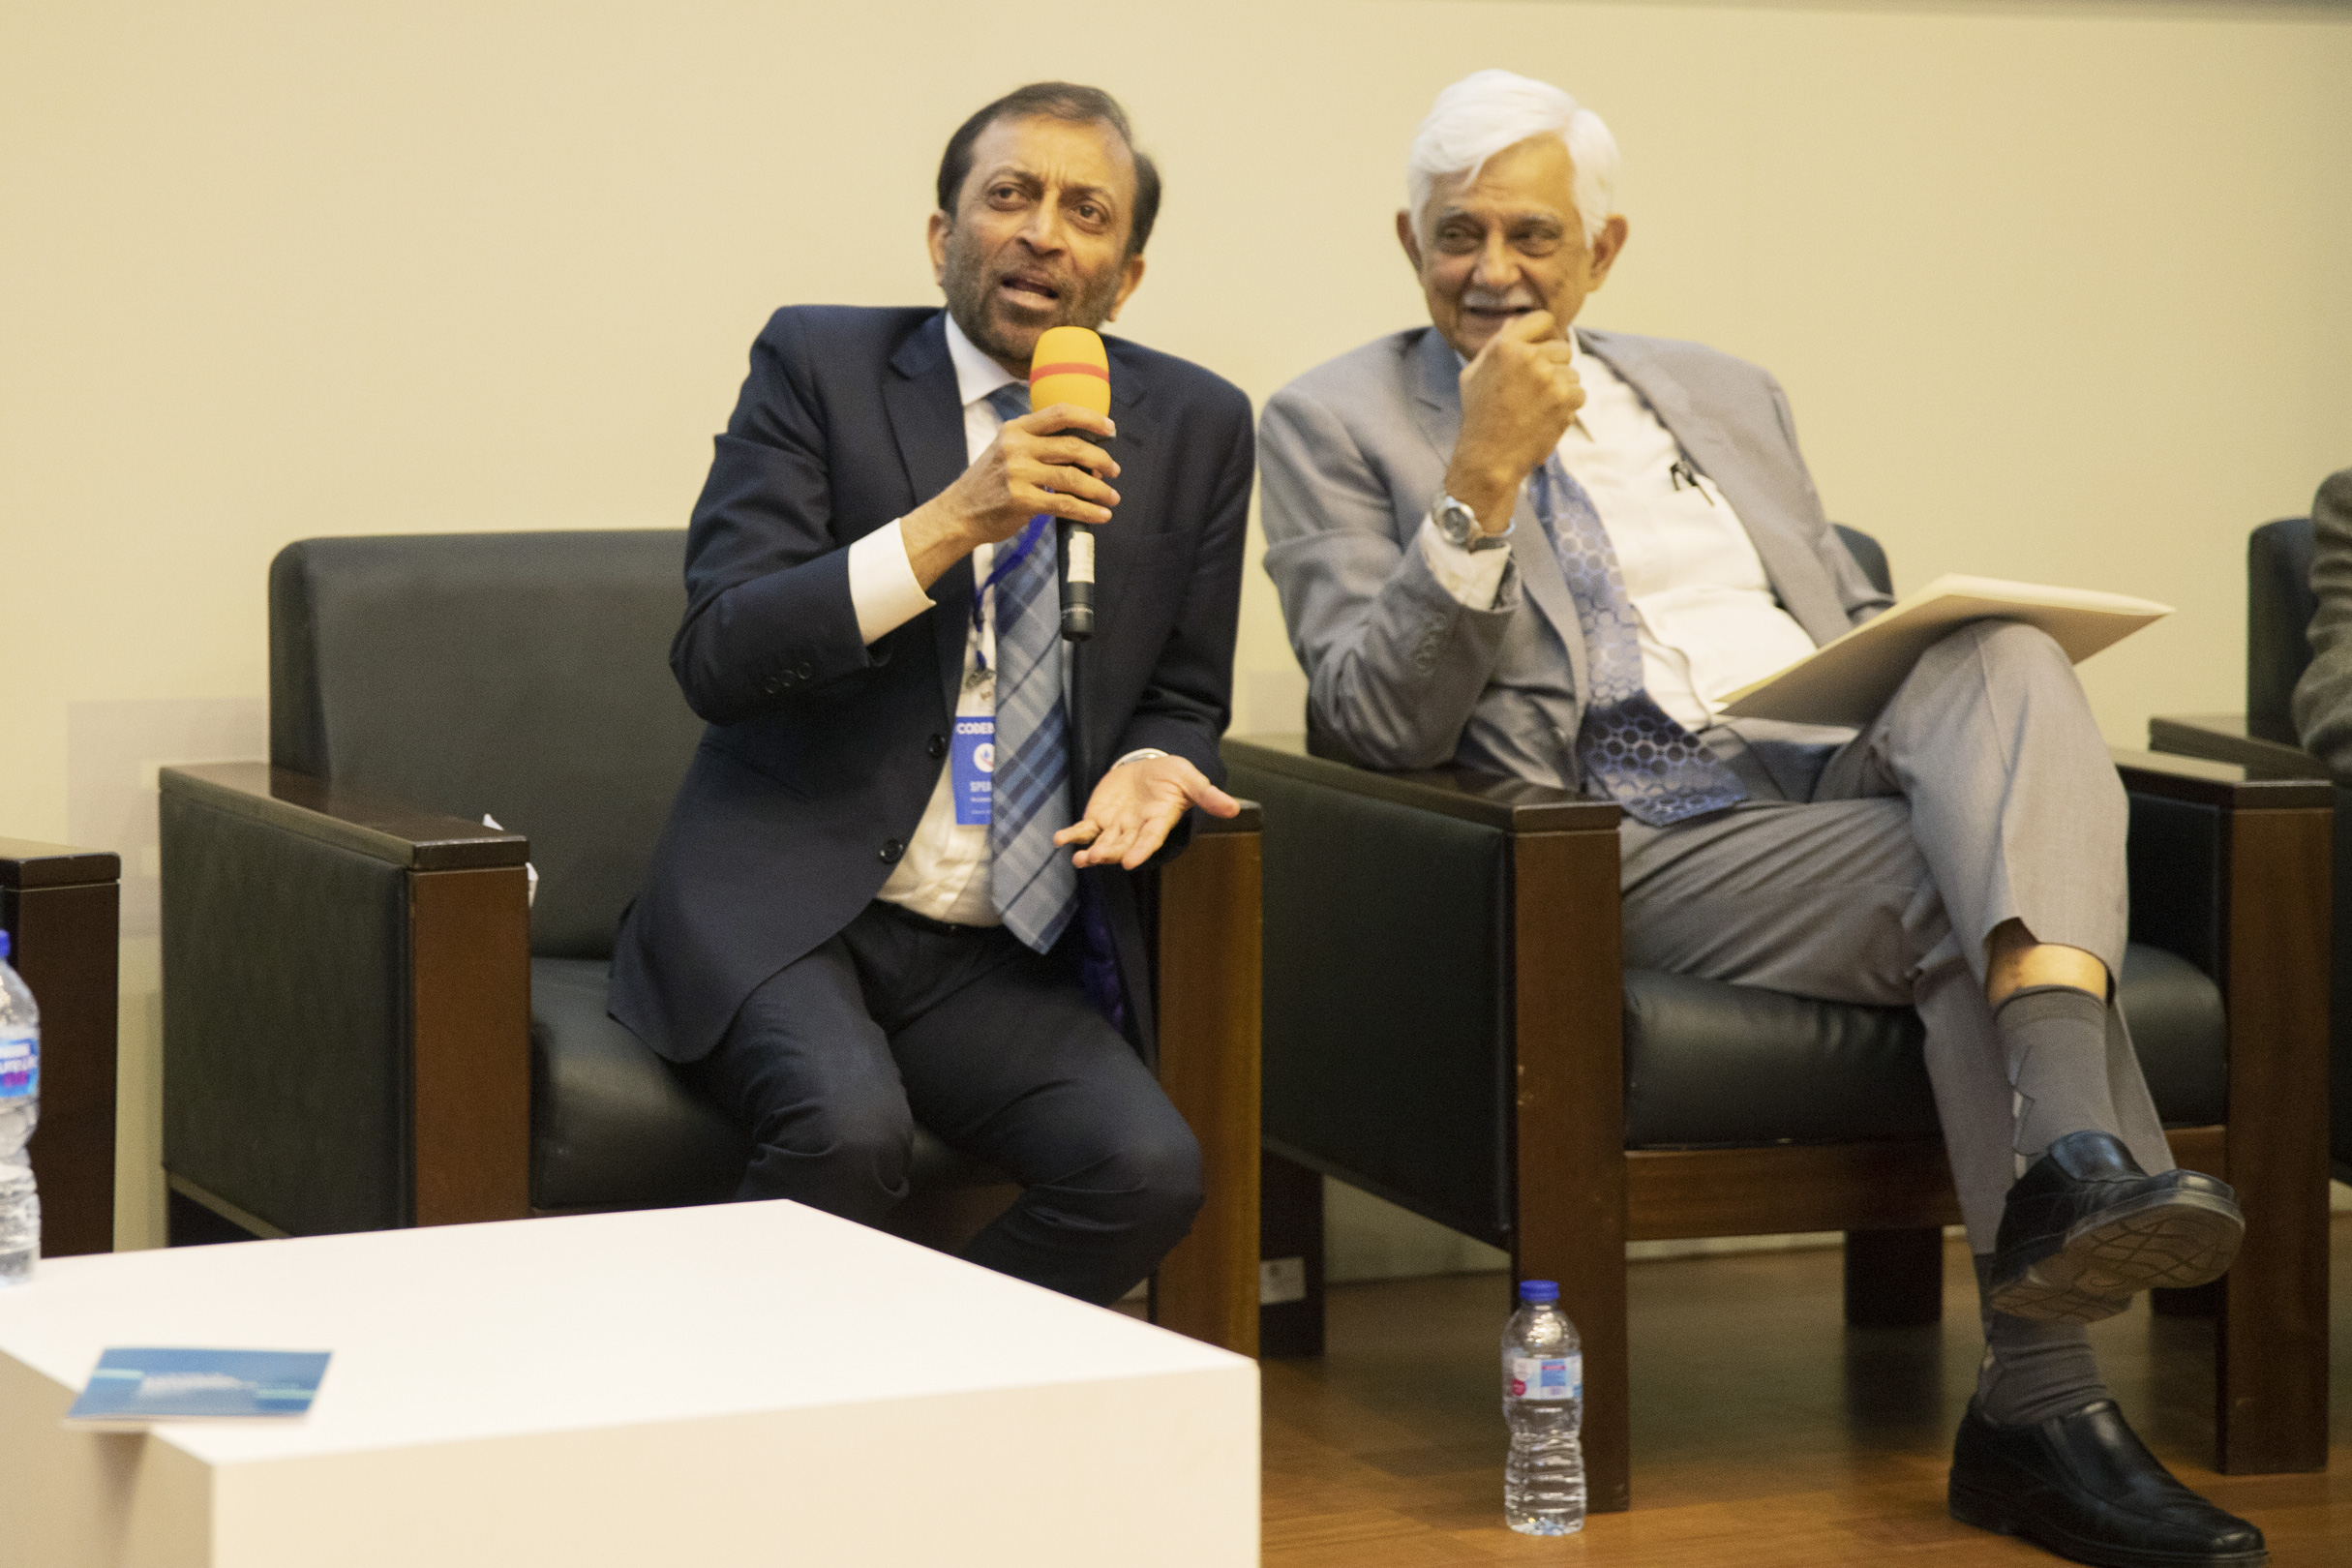 Farooq Sattar and Taj Haider during a panel discussion.